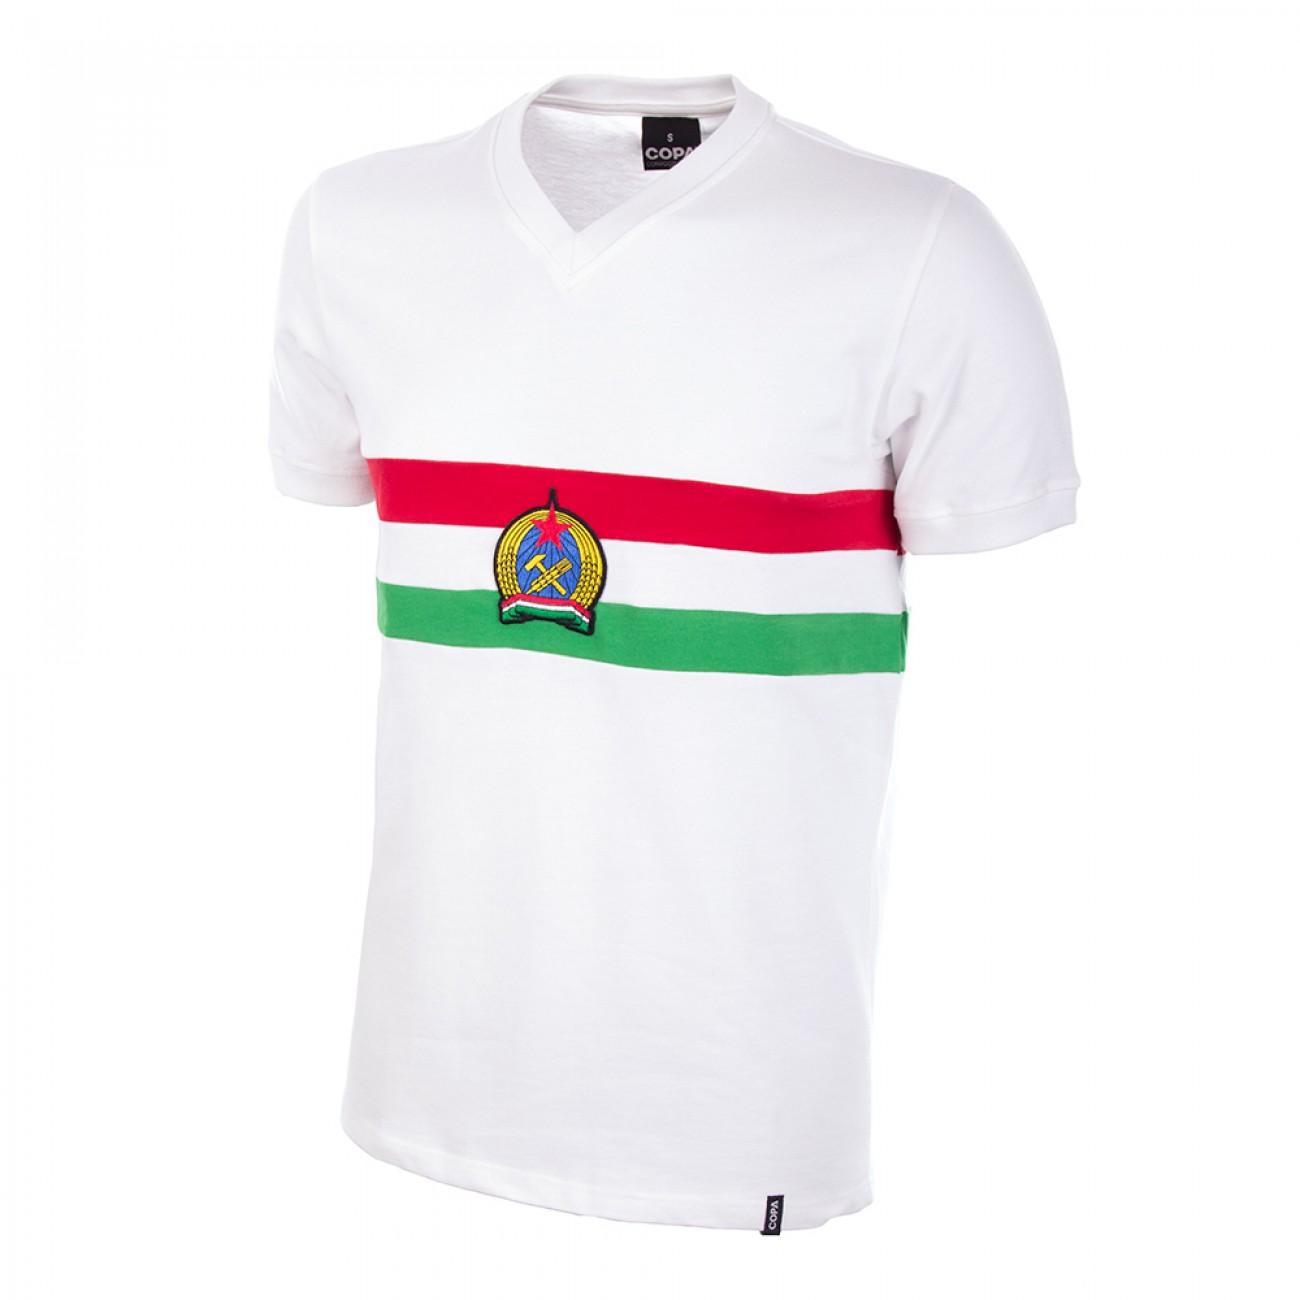 http://www.retrofootball.es/ropa-de-futbol/camiseta-hungria-mundial-1954.html